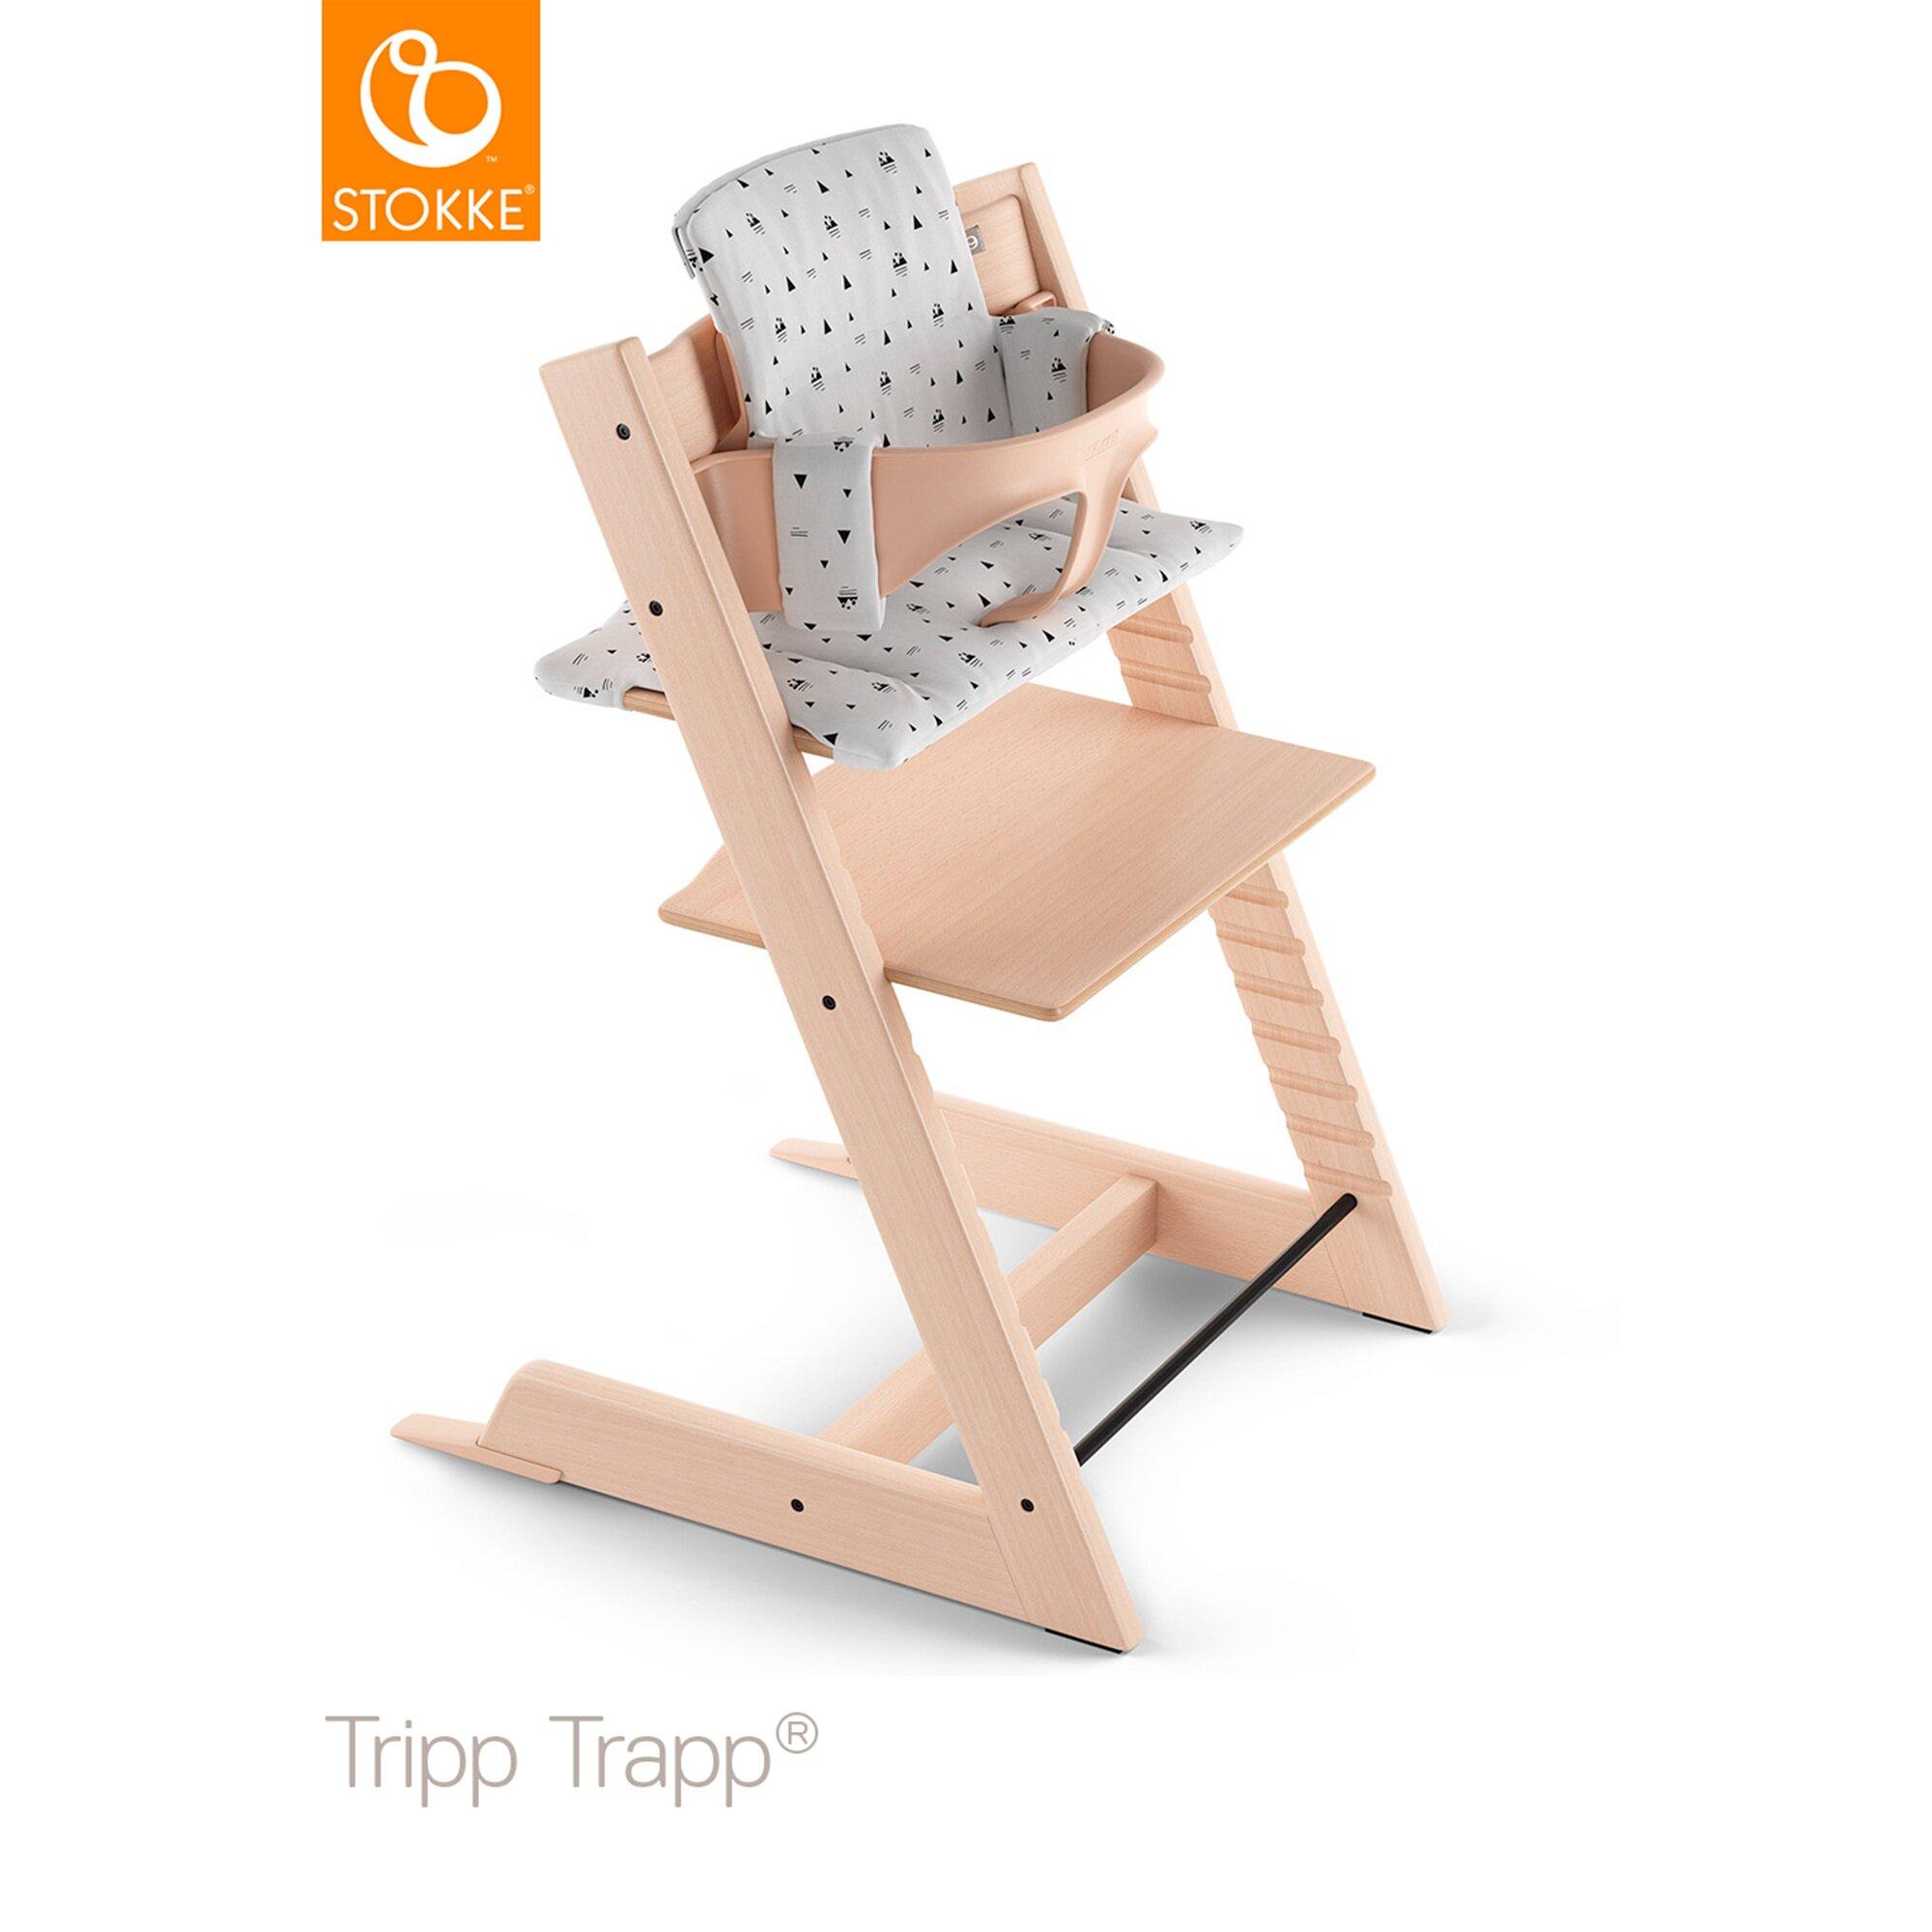 tripp-trapp-classic-sitzkissen-organic-cotton